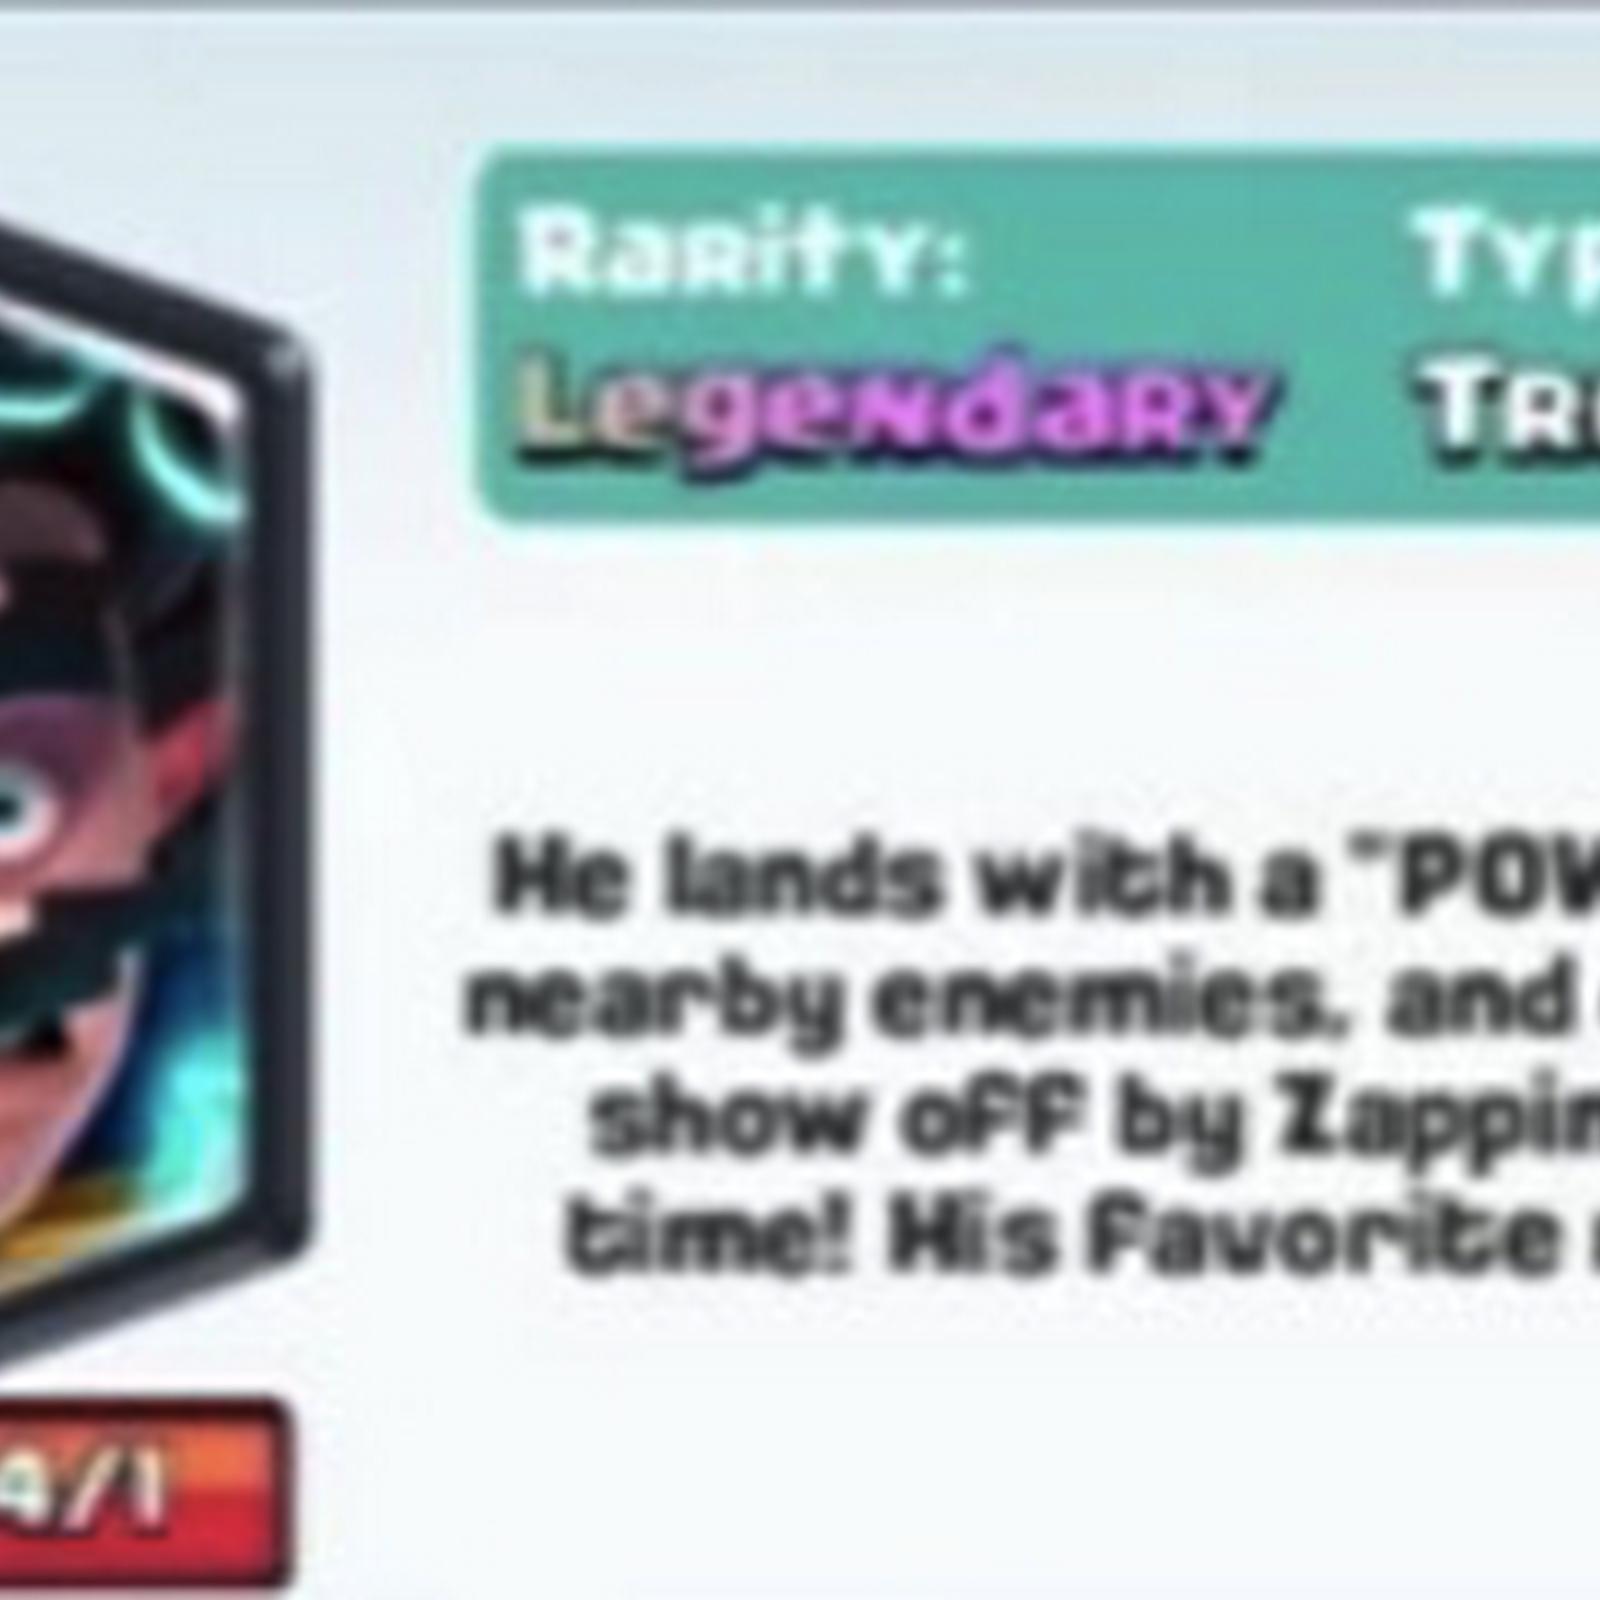 Electro Wizard clash royale legendary update (December 2016)